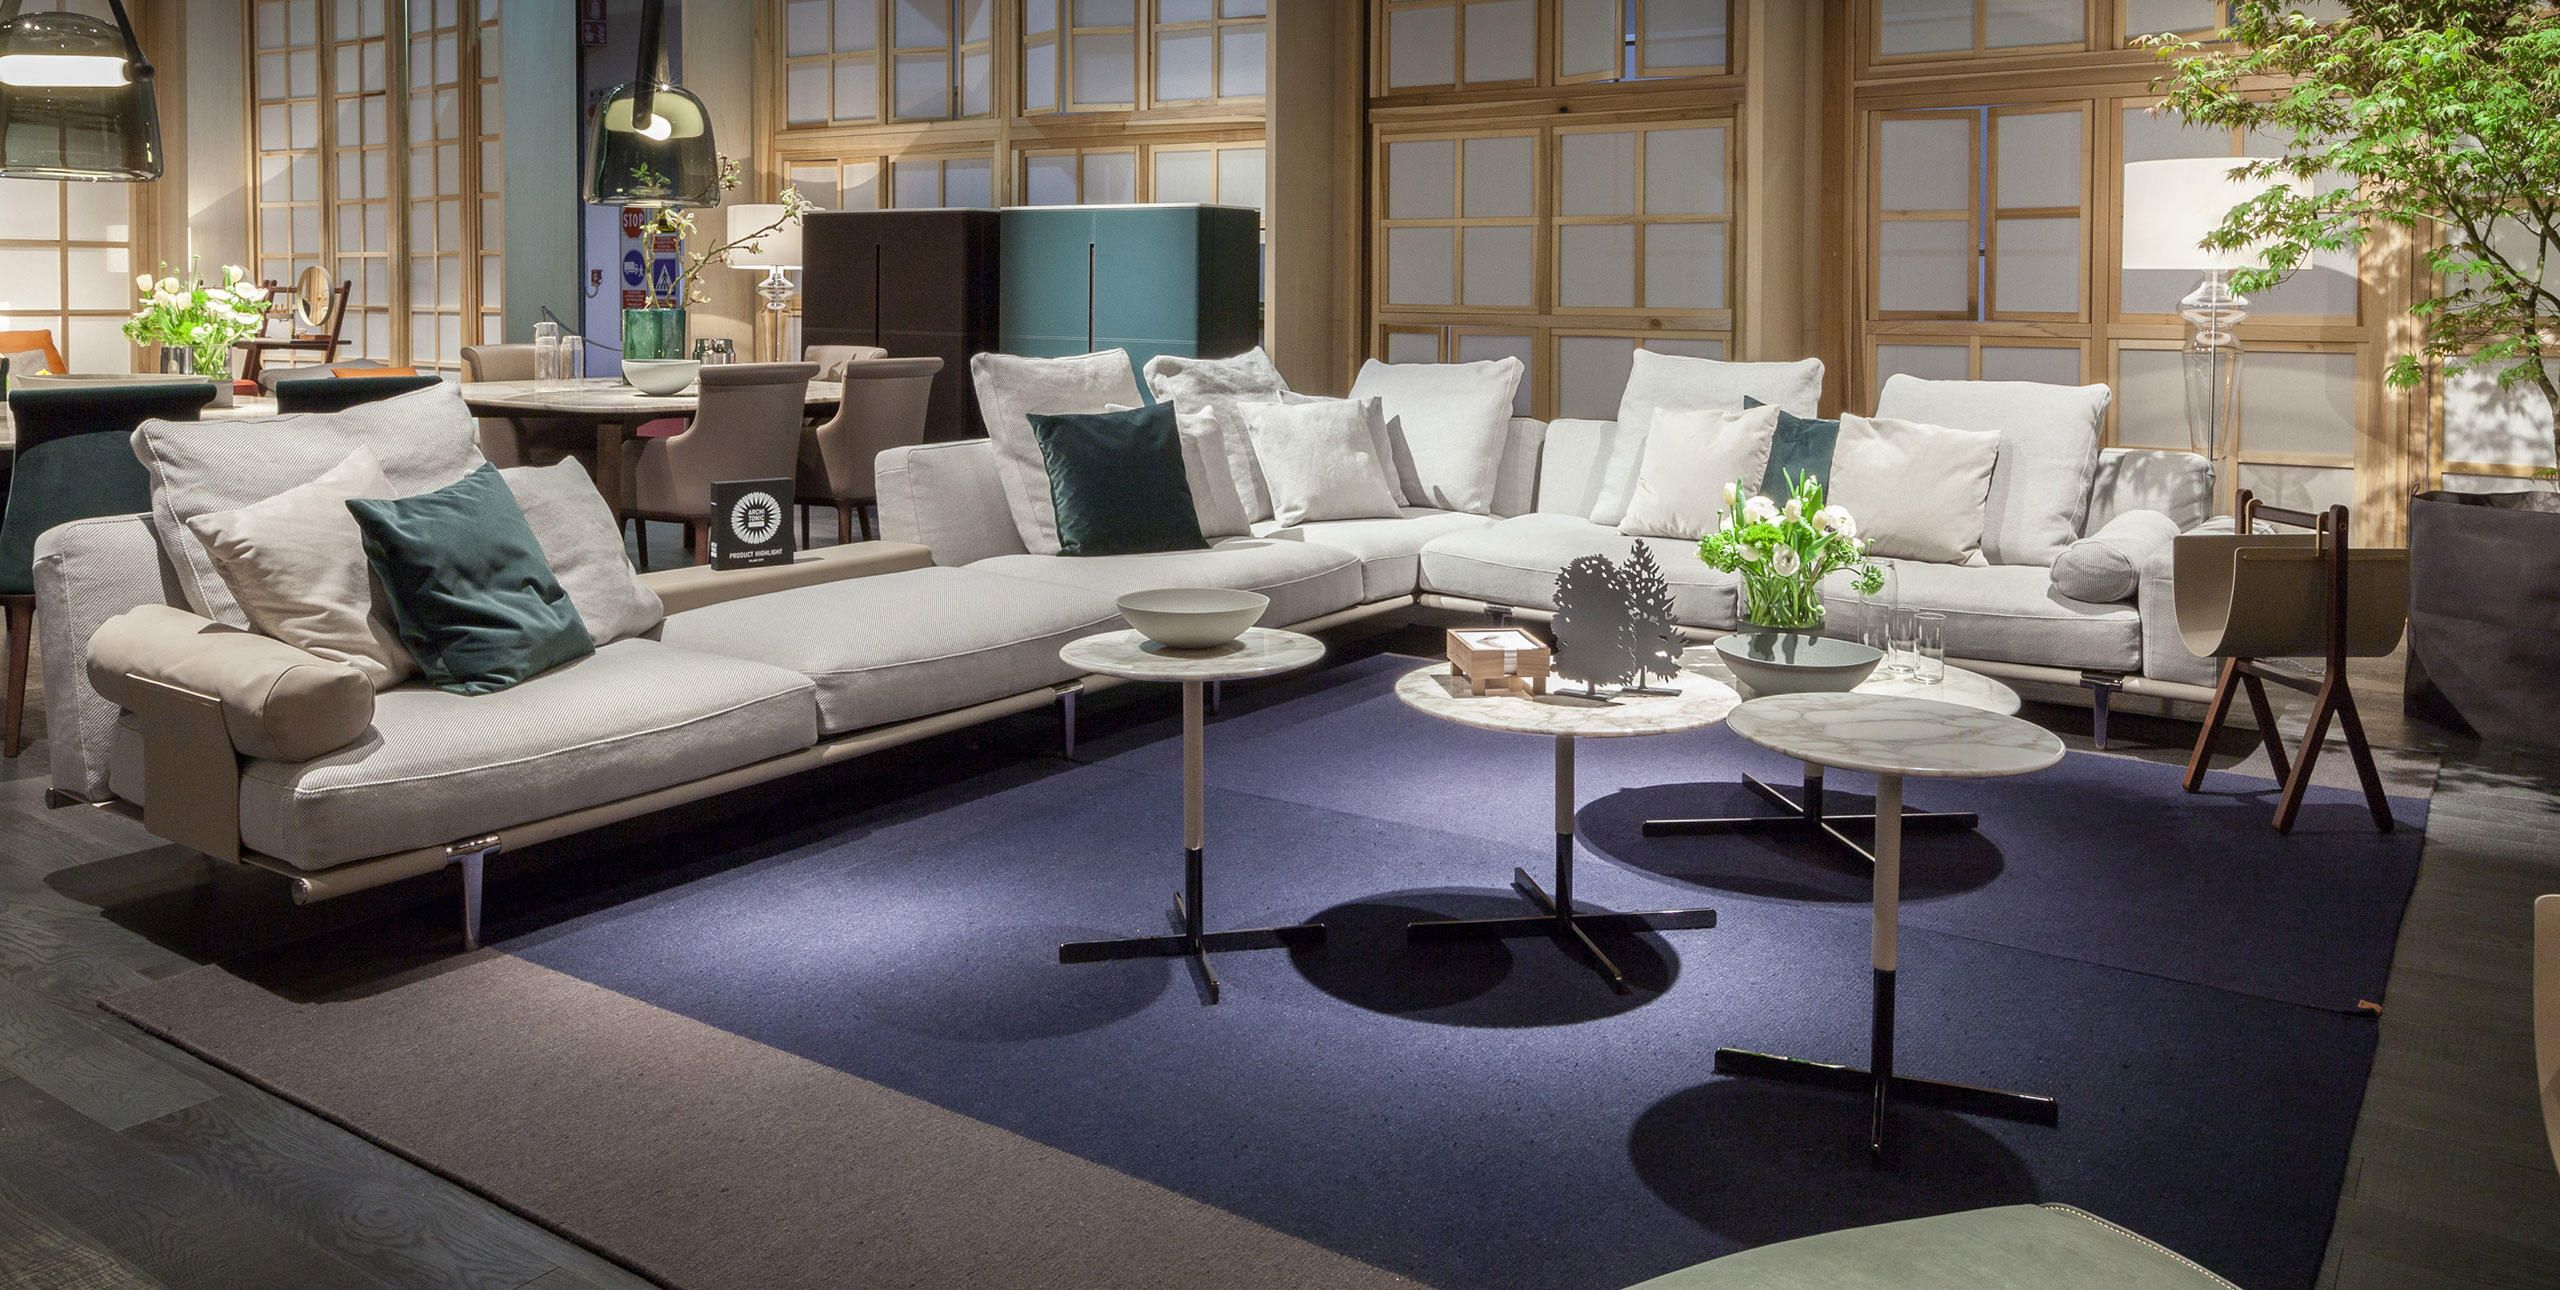 Sofas By Ludovica Roberto Palomba And Explore Poltrona Frau S  # Muebles Di Giano